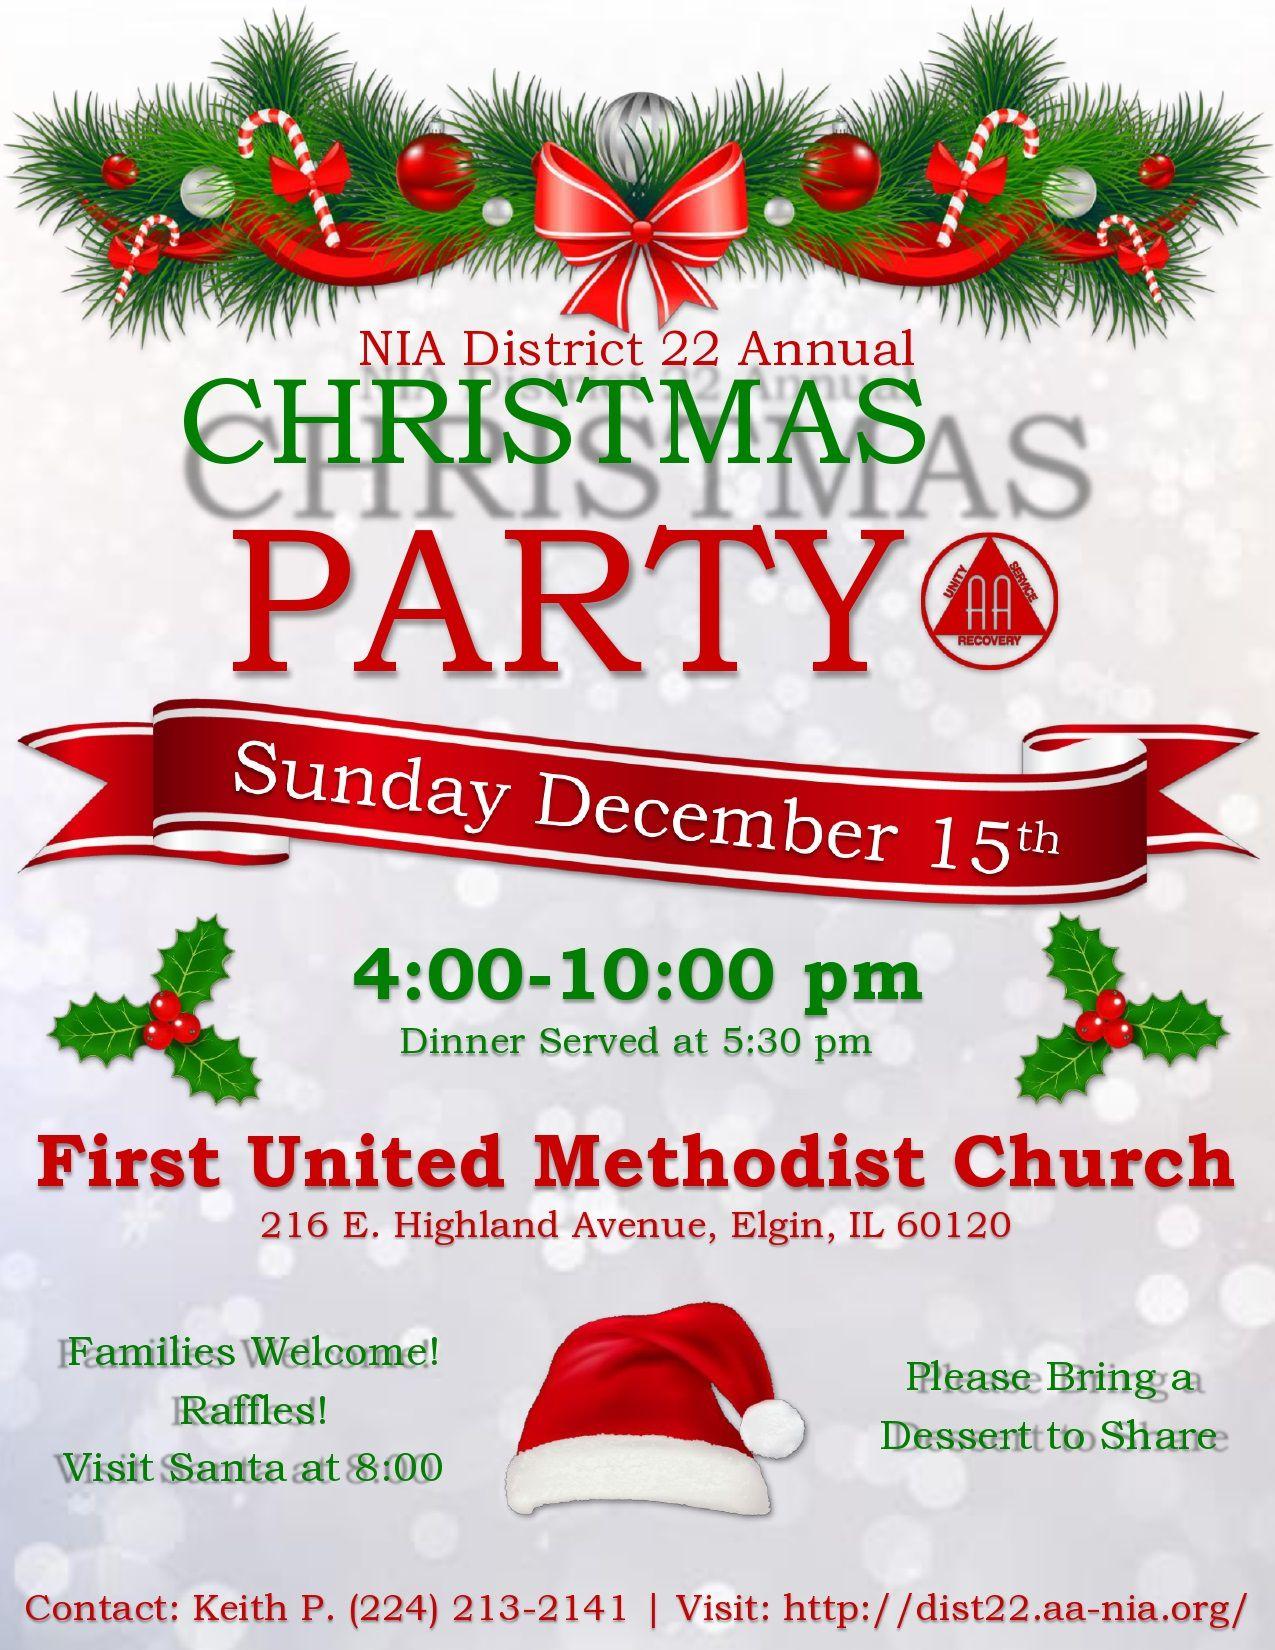 006 Phenomenal Free Church Christma Program Template Concept Full